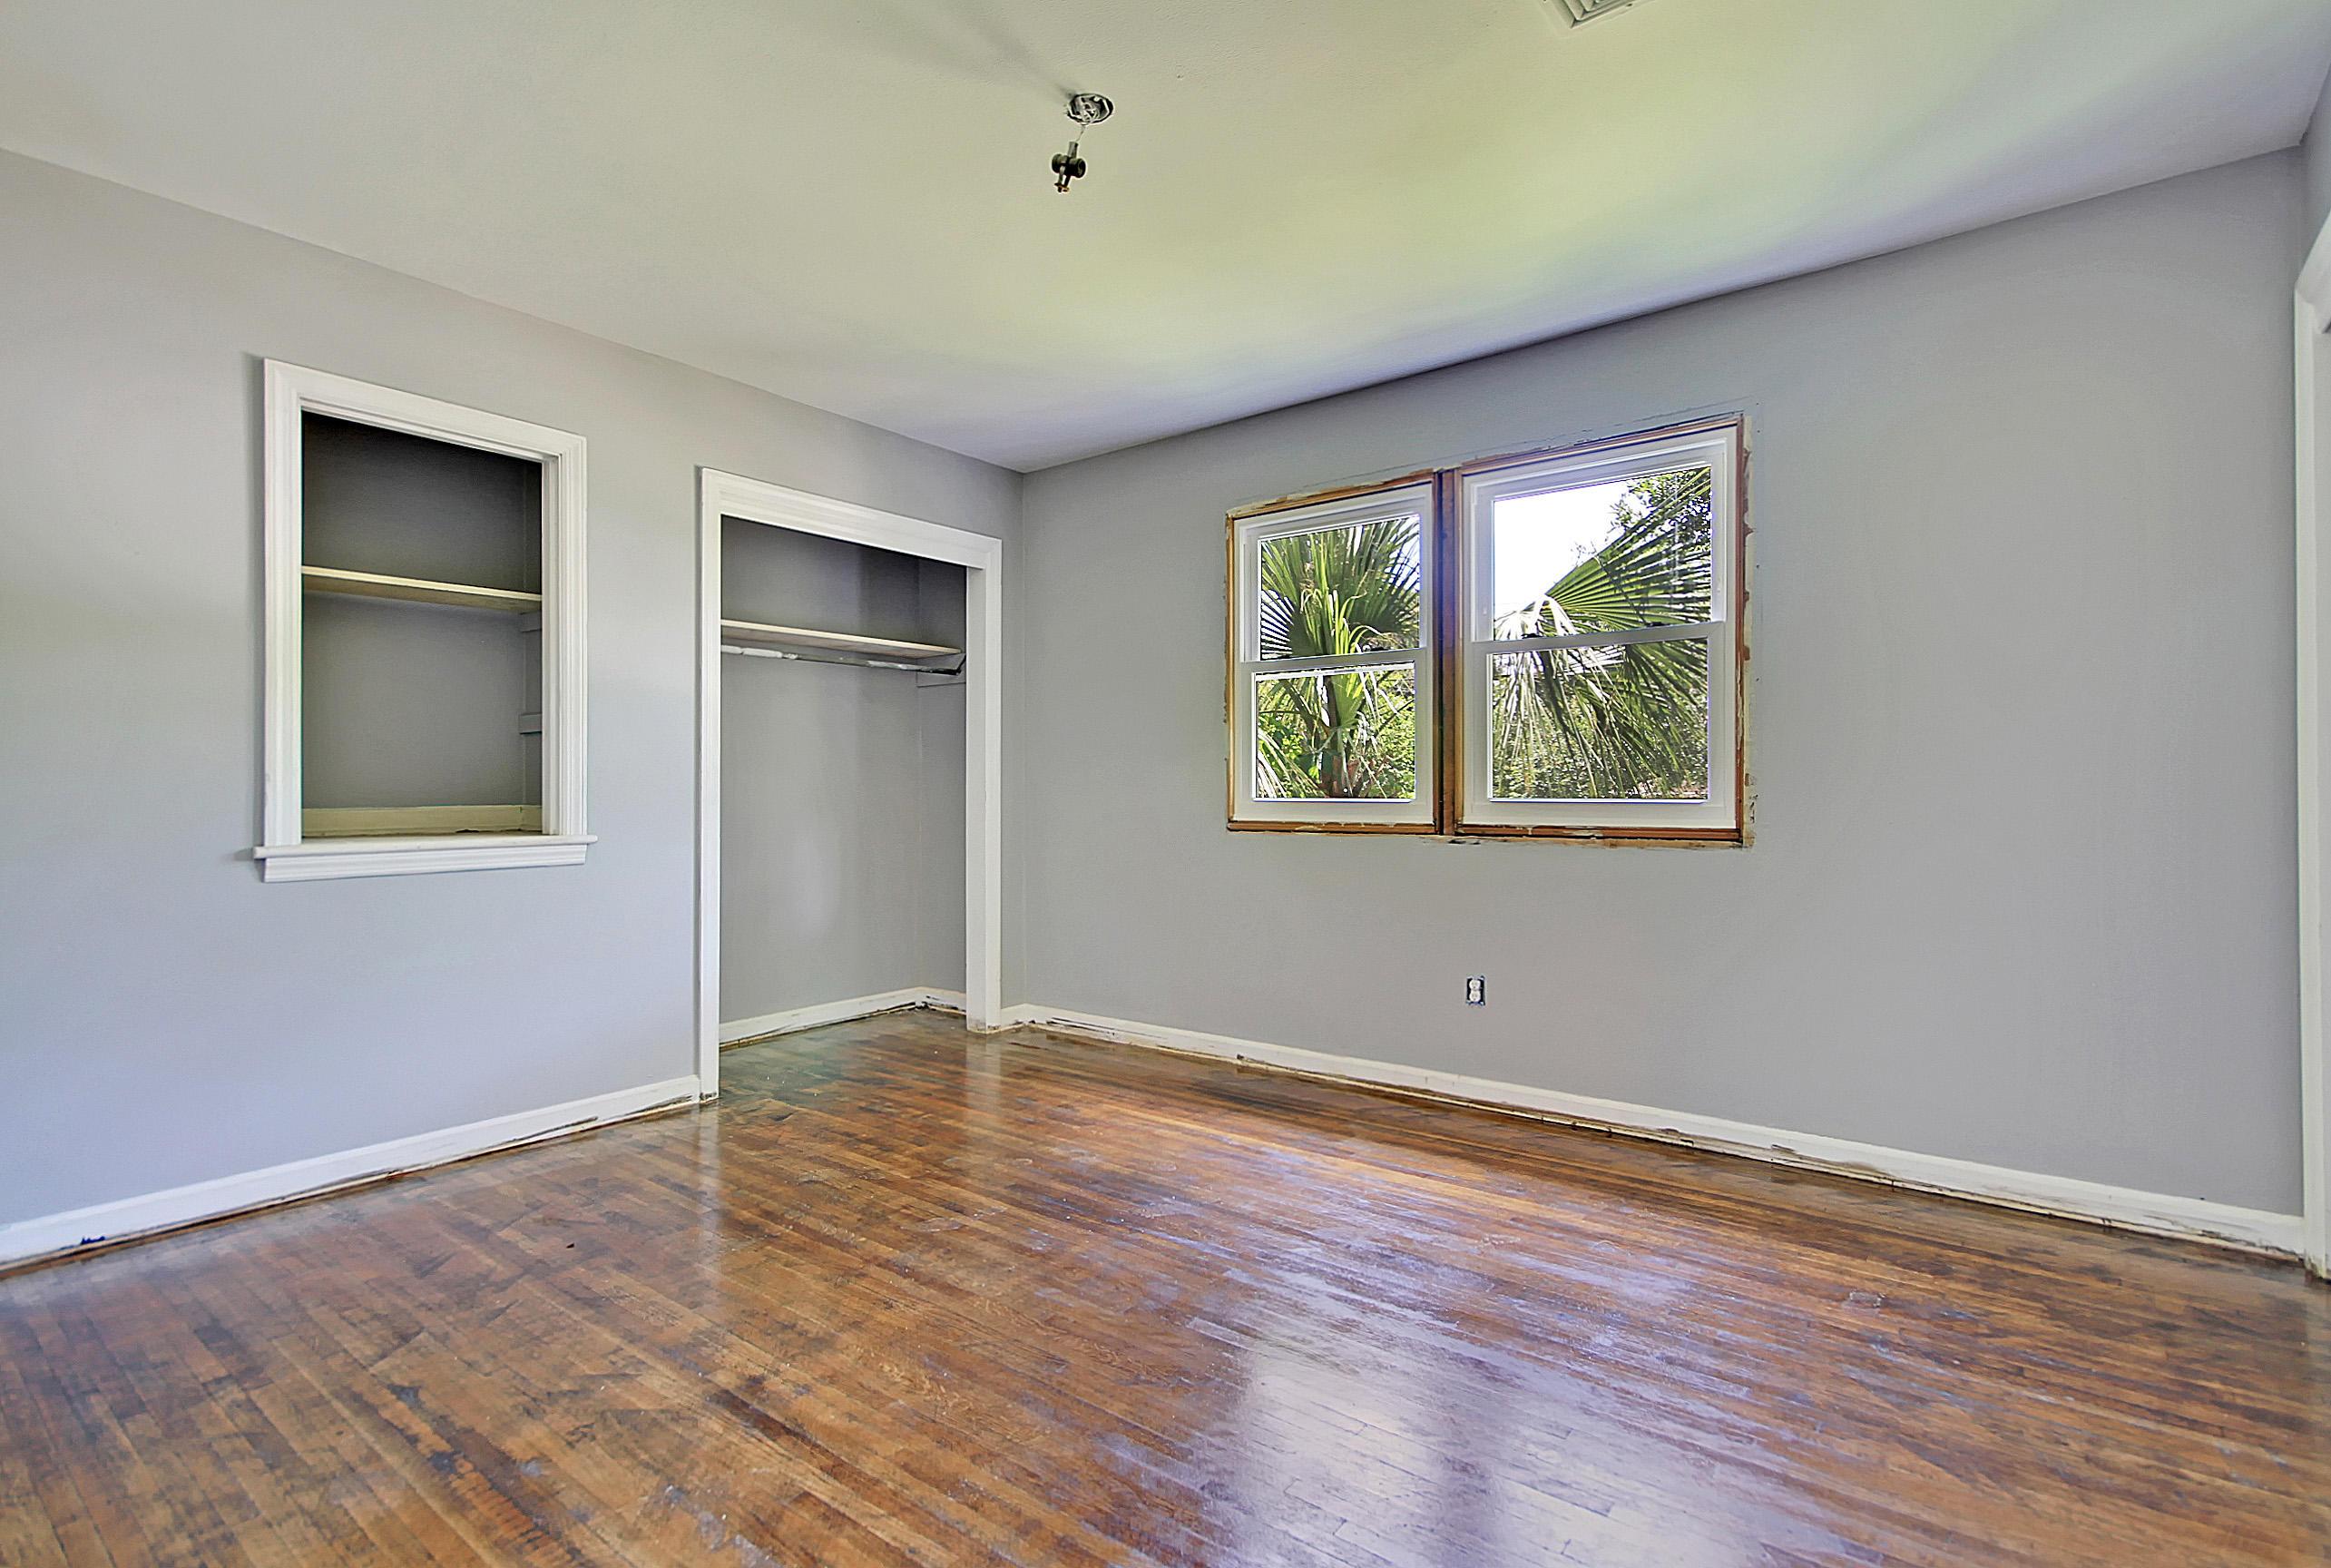 Northbridge Terrace Homes For Sale - 1094 Northbridge, Charleston, SC - 2